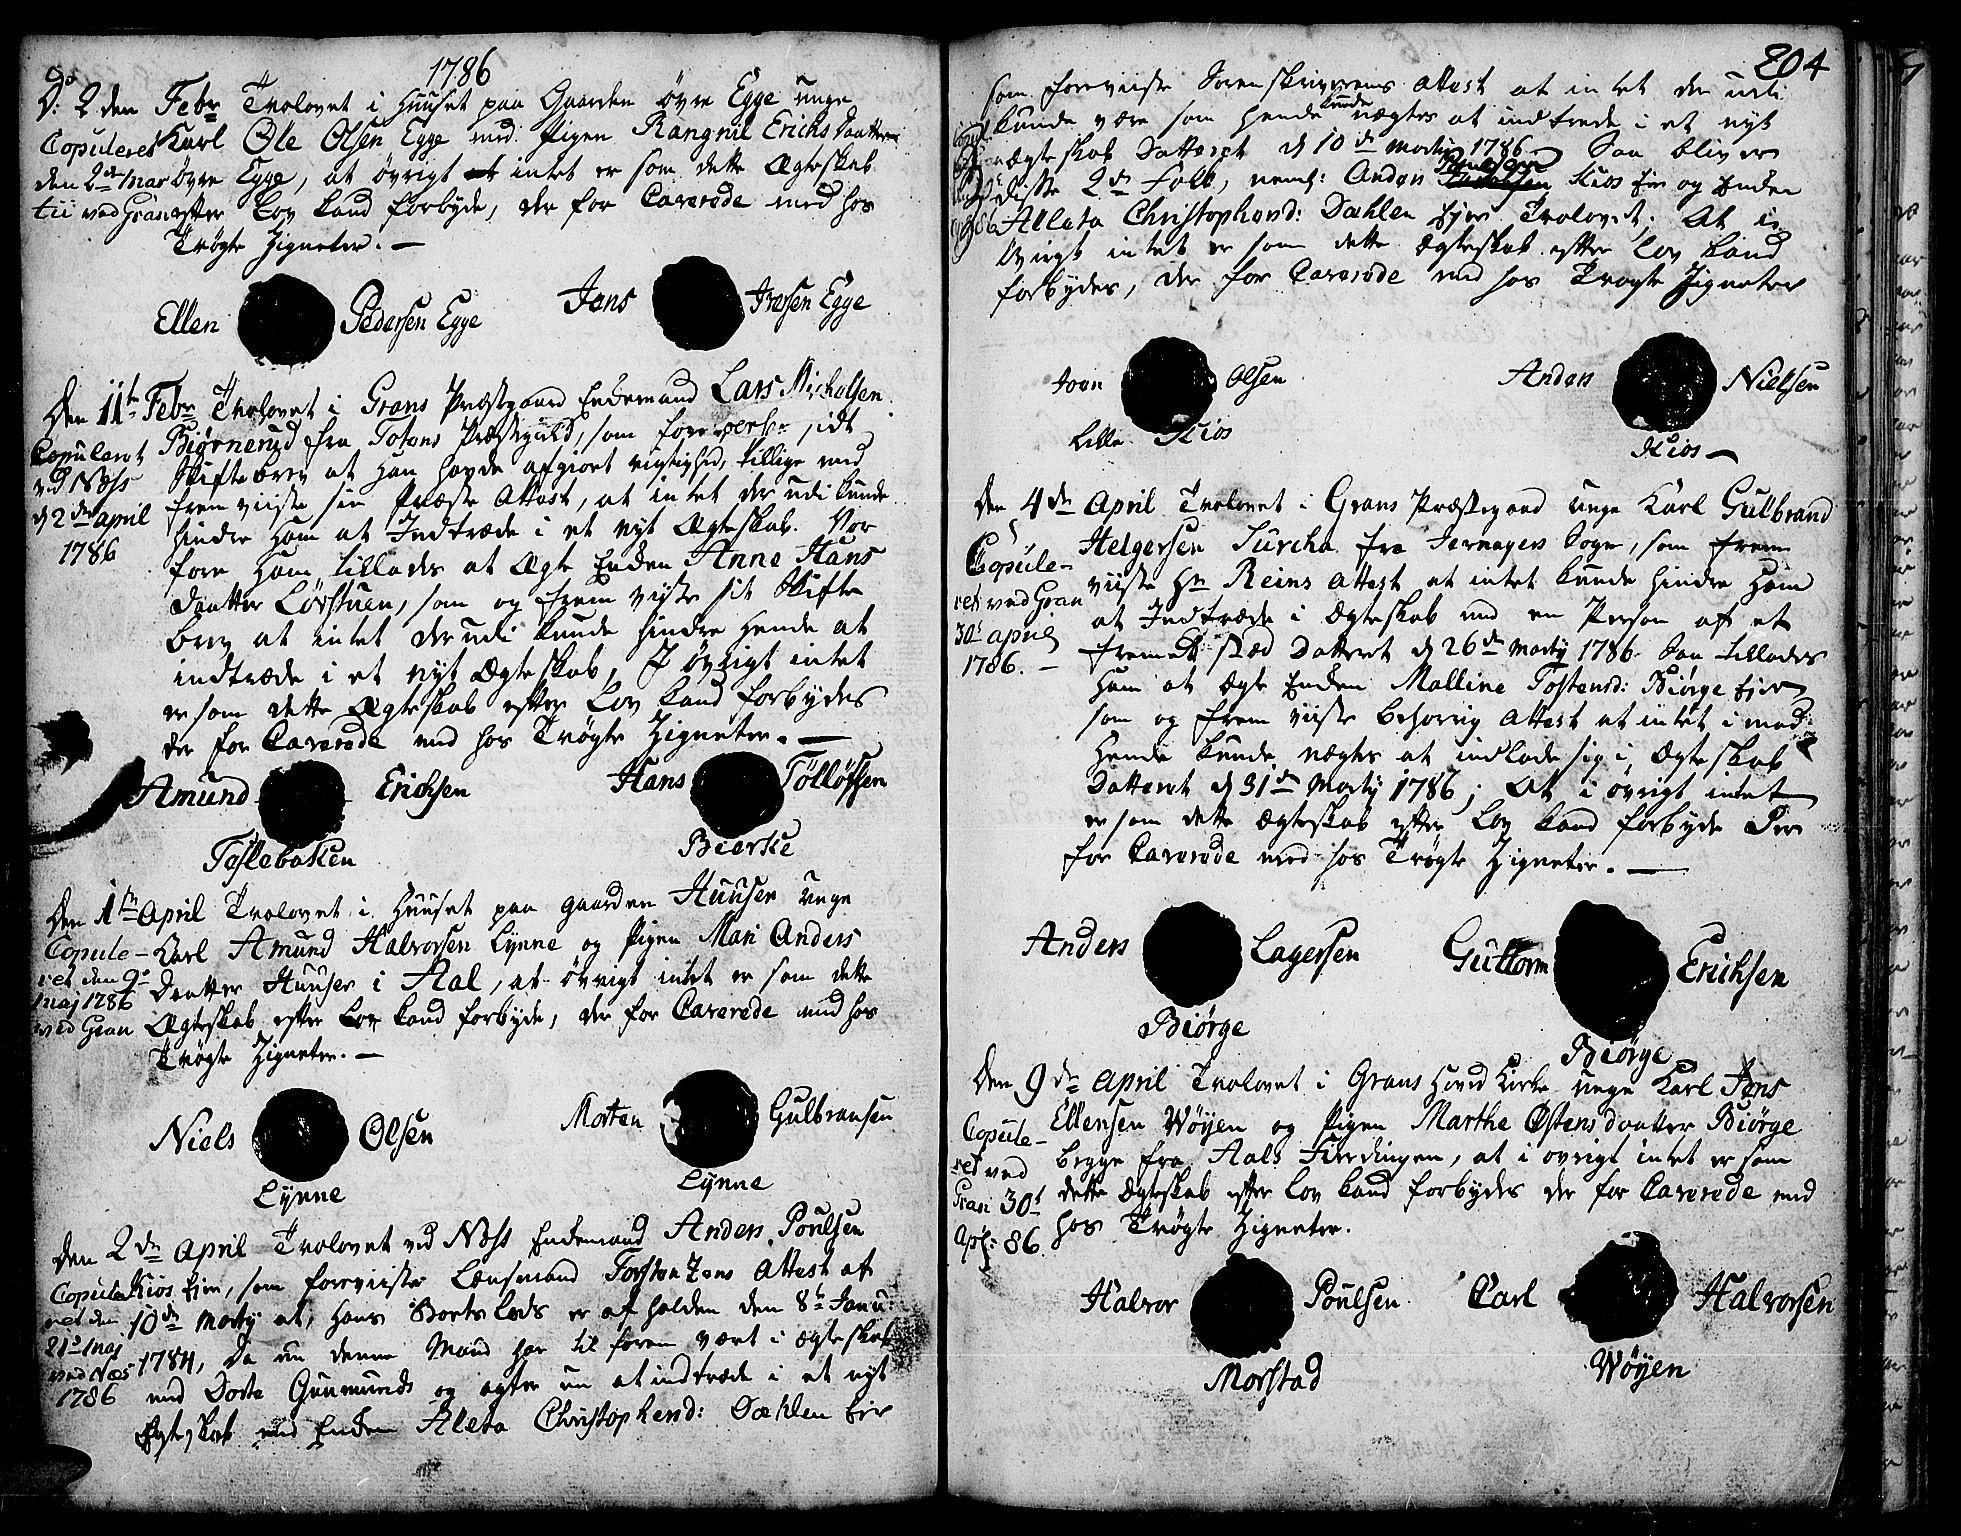 SAH, Gran prestekontor, Ministerialbok nr. 5, 1776-1788, s. 204